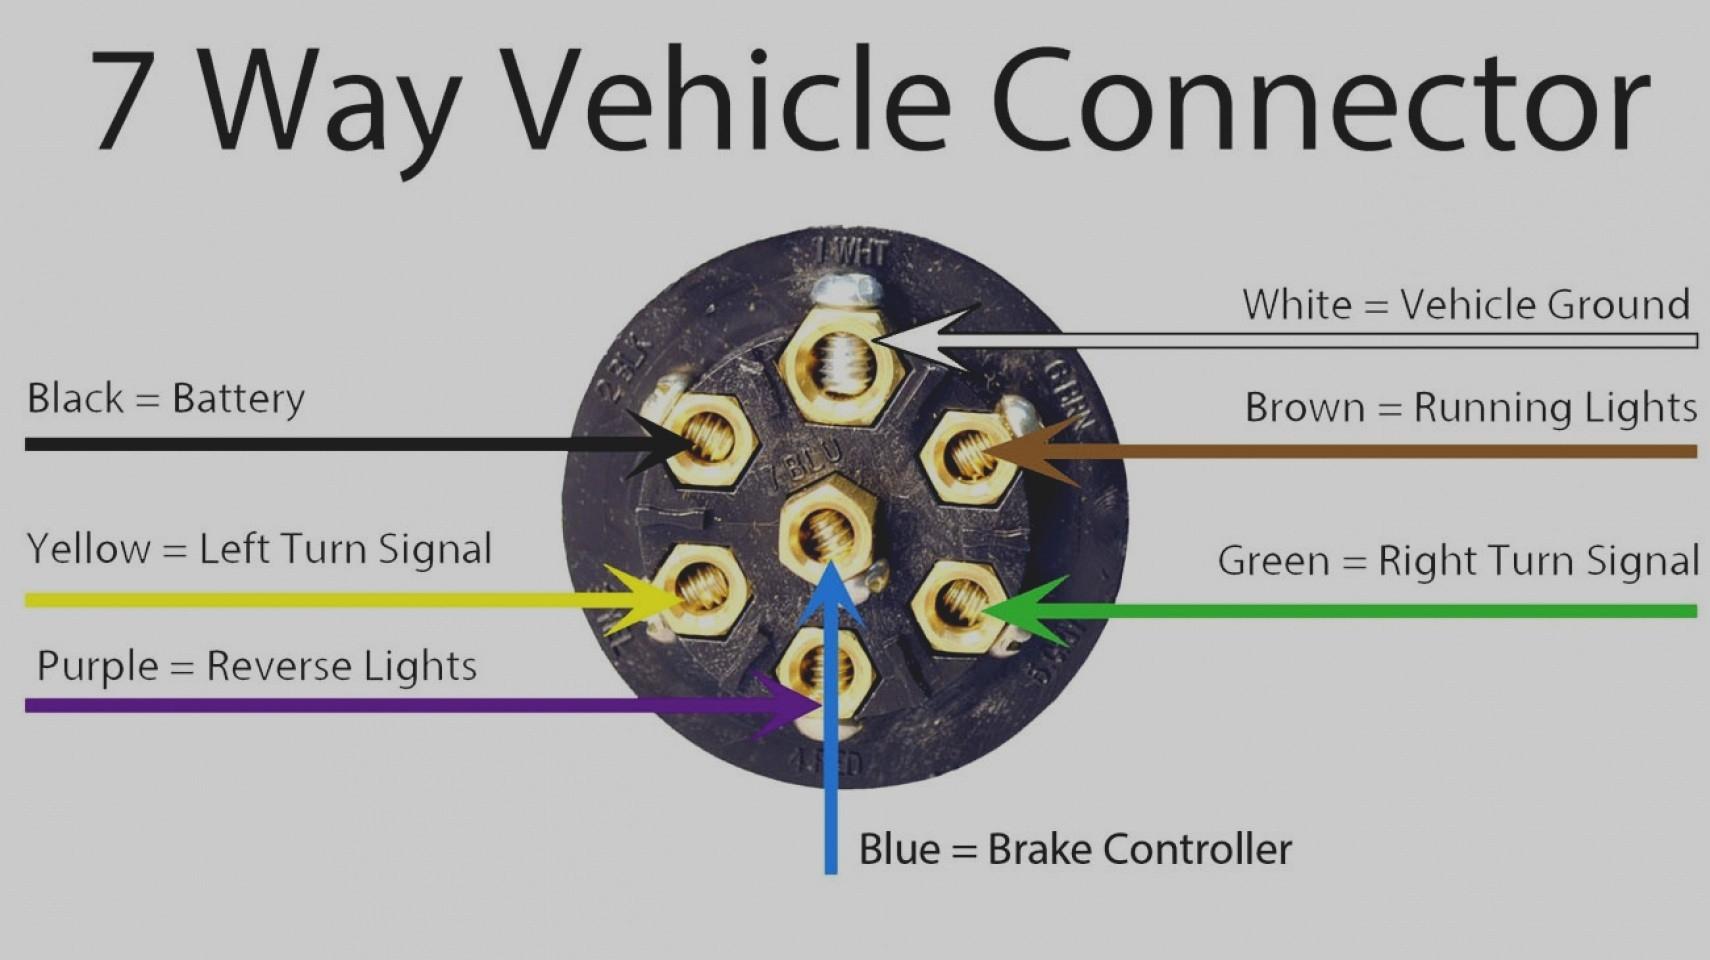 Curt Wiring Diagram | Wiring Library - Seven Pin Wiring Diagram